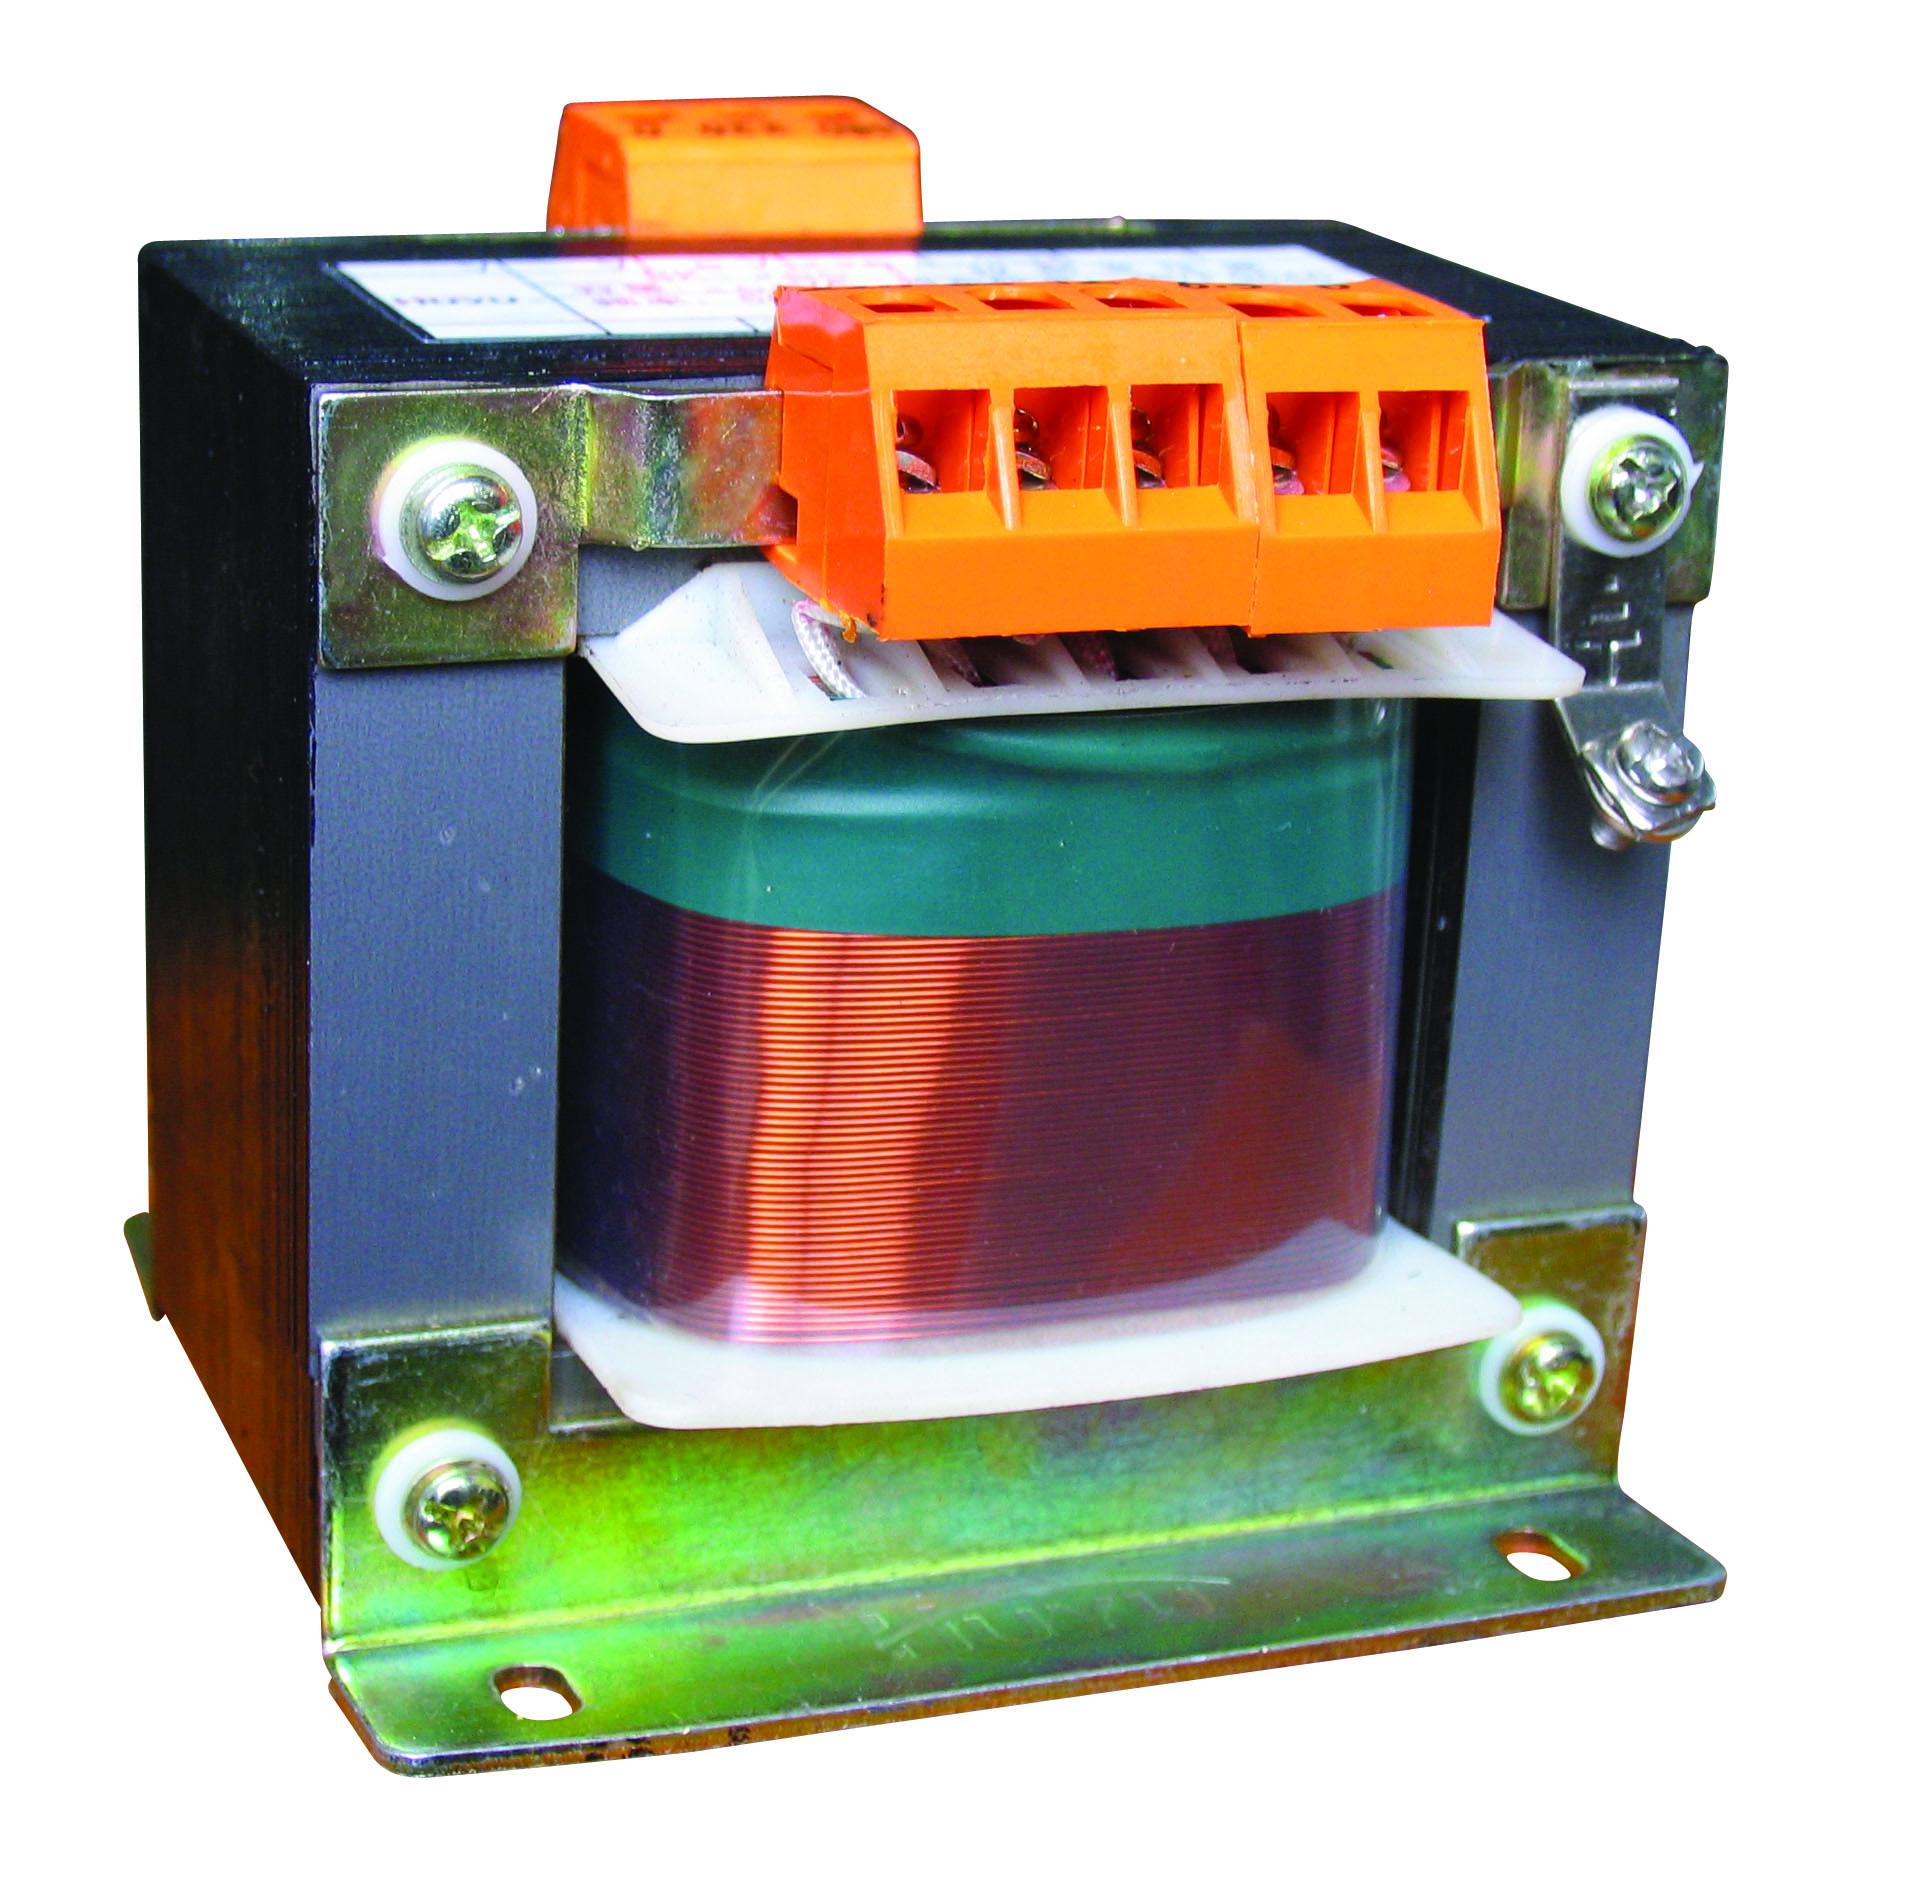 BK Series control transformer